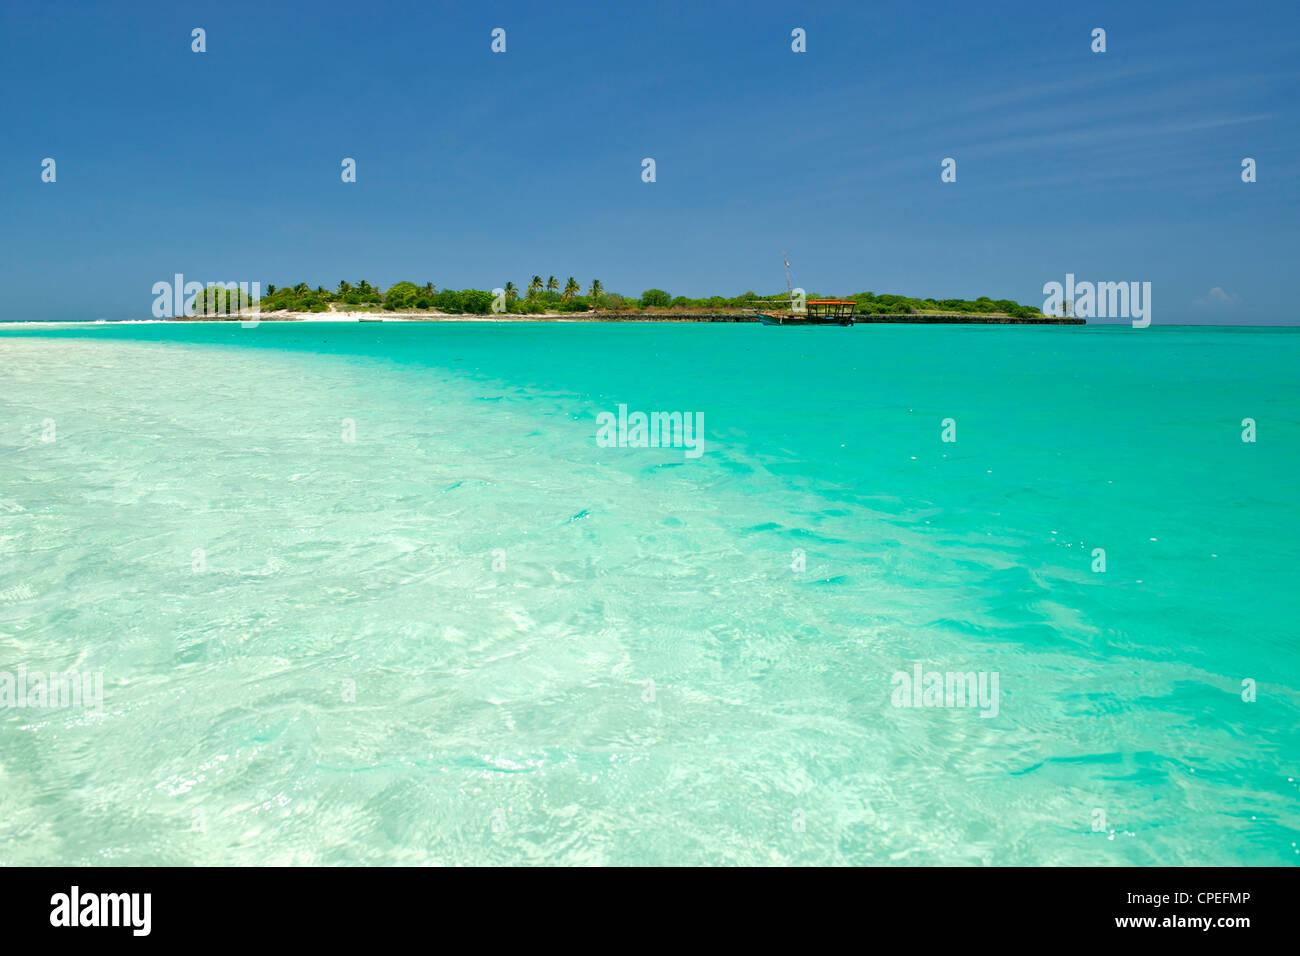 Mogundula island in the Quirimbas archipelago in northern Mozambique. - Stock Image